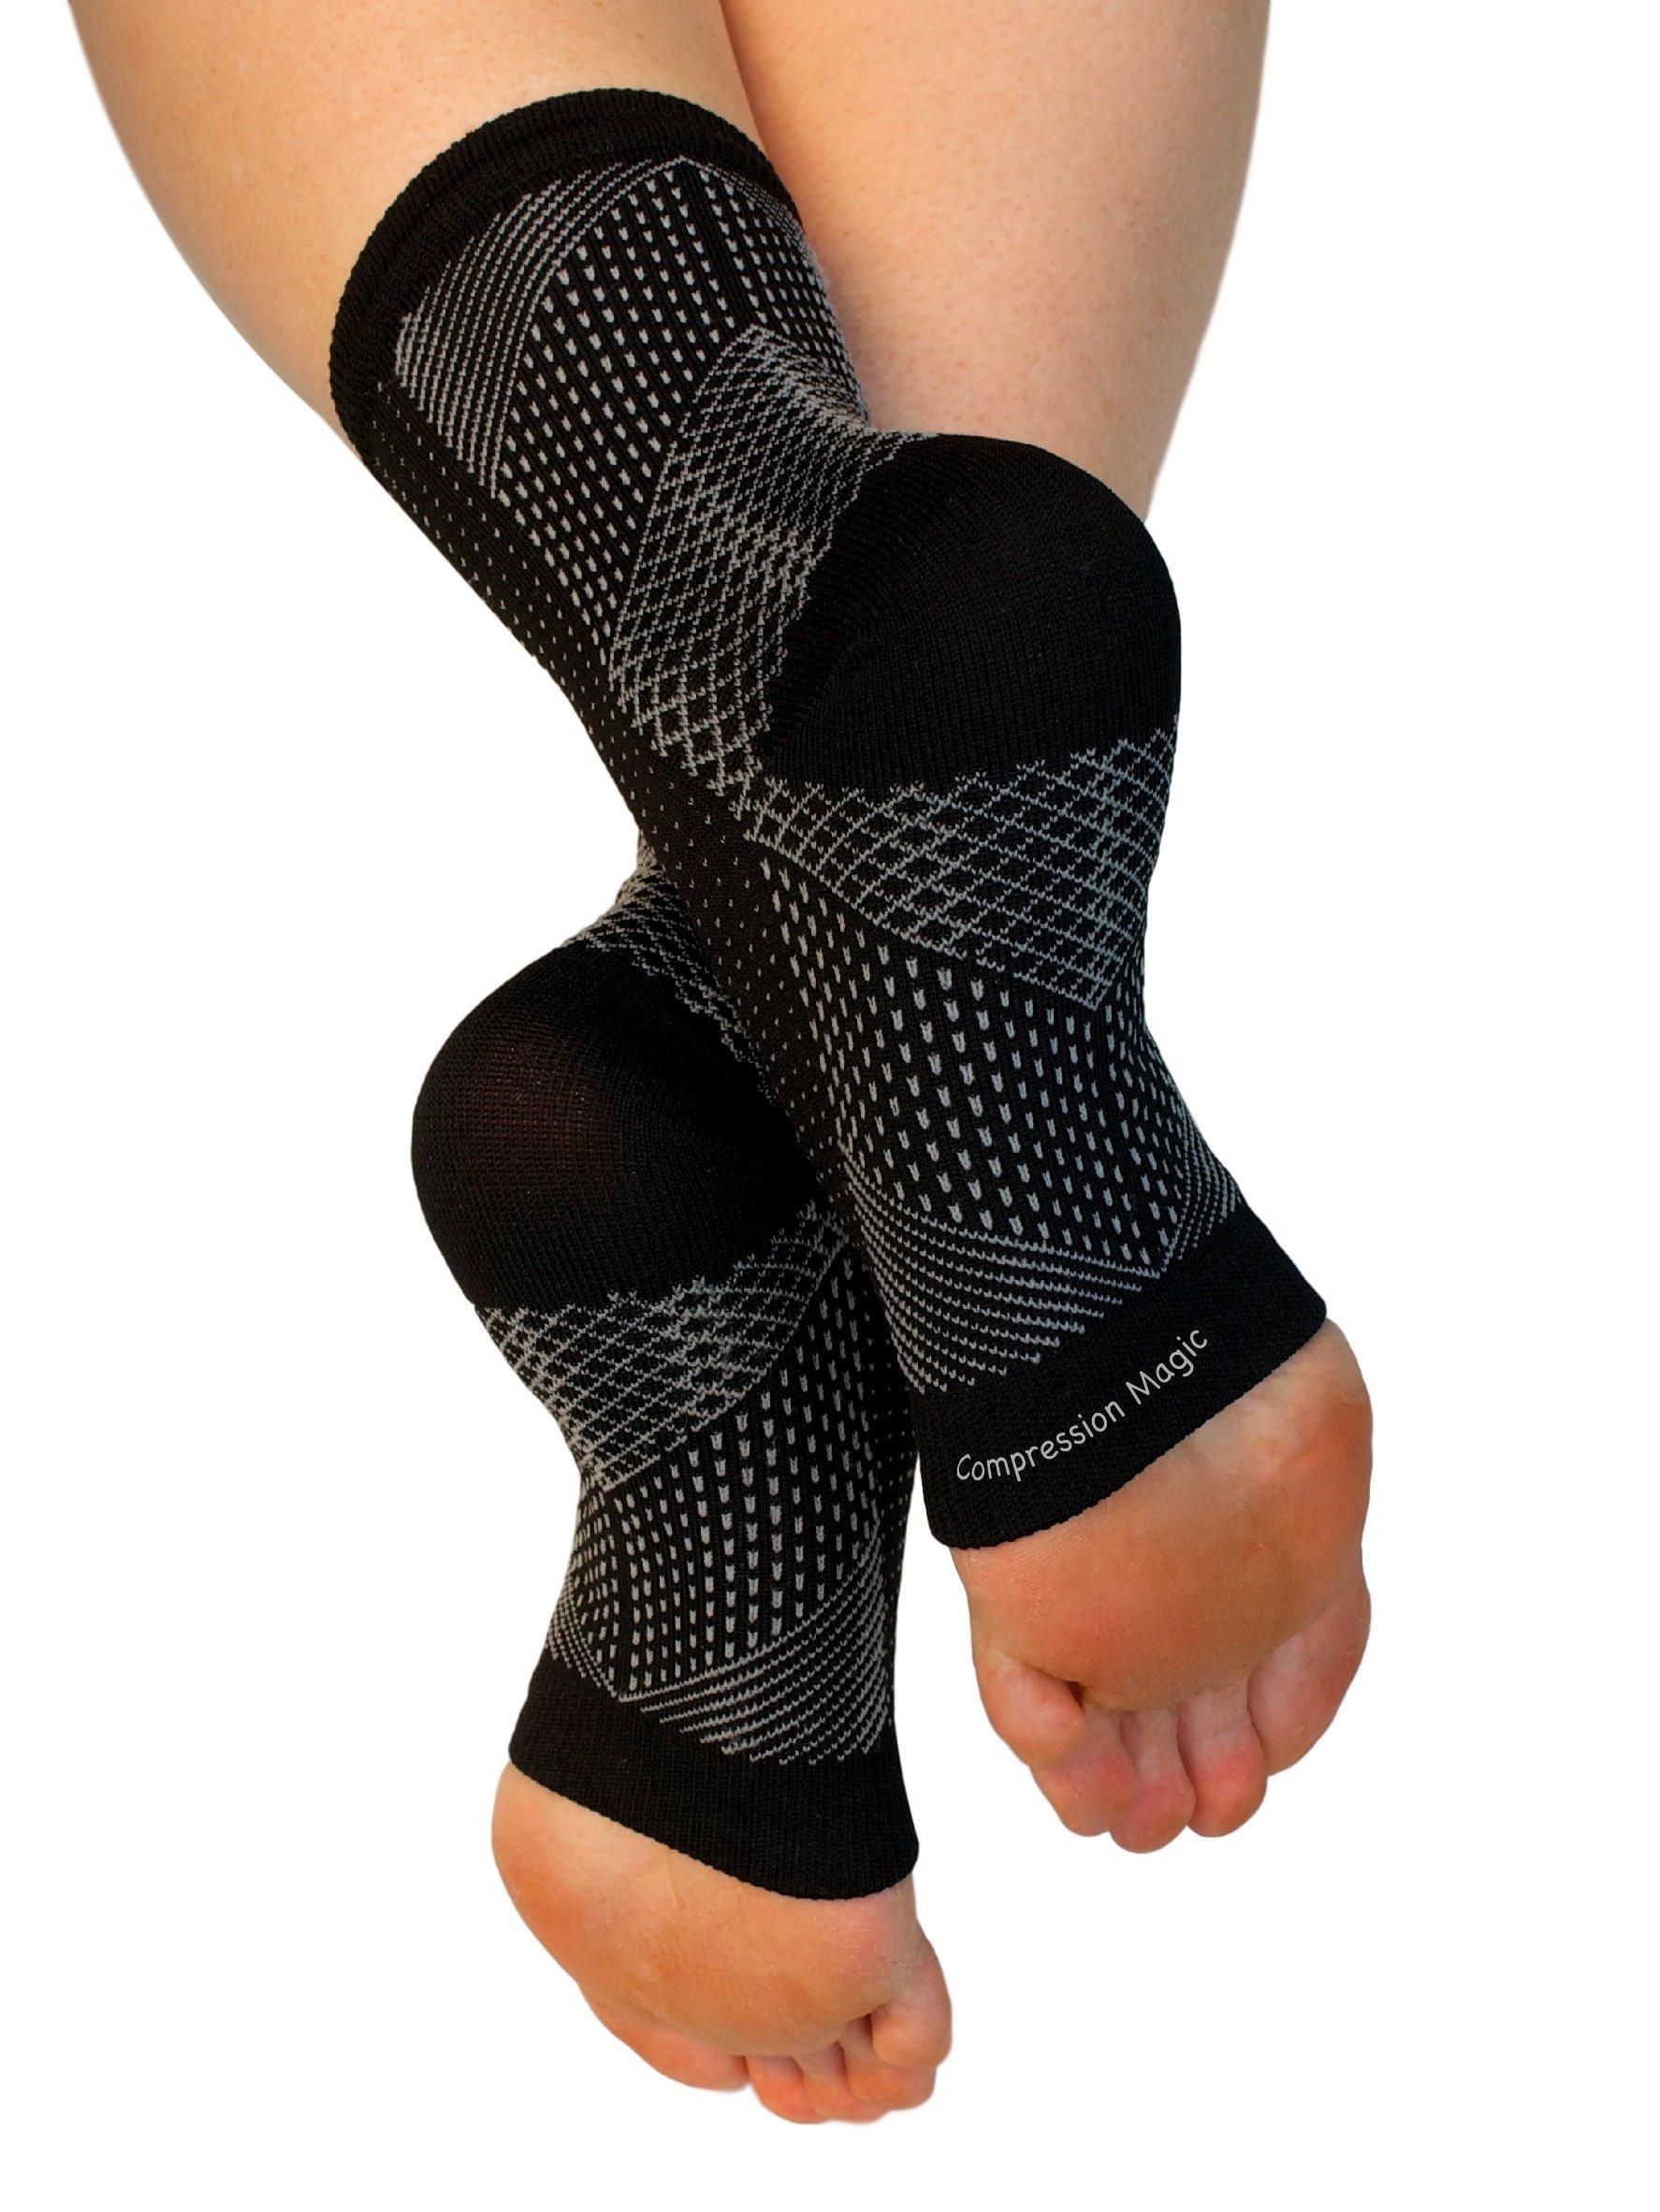 Amazon.com: Skinny Feet: Edema Swollen Ankle Legs